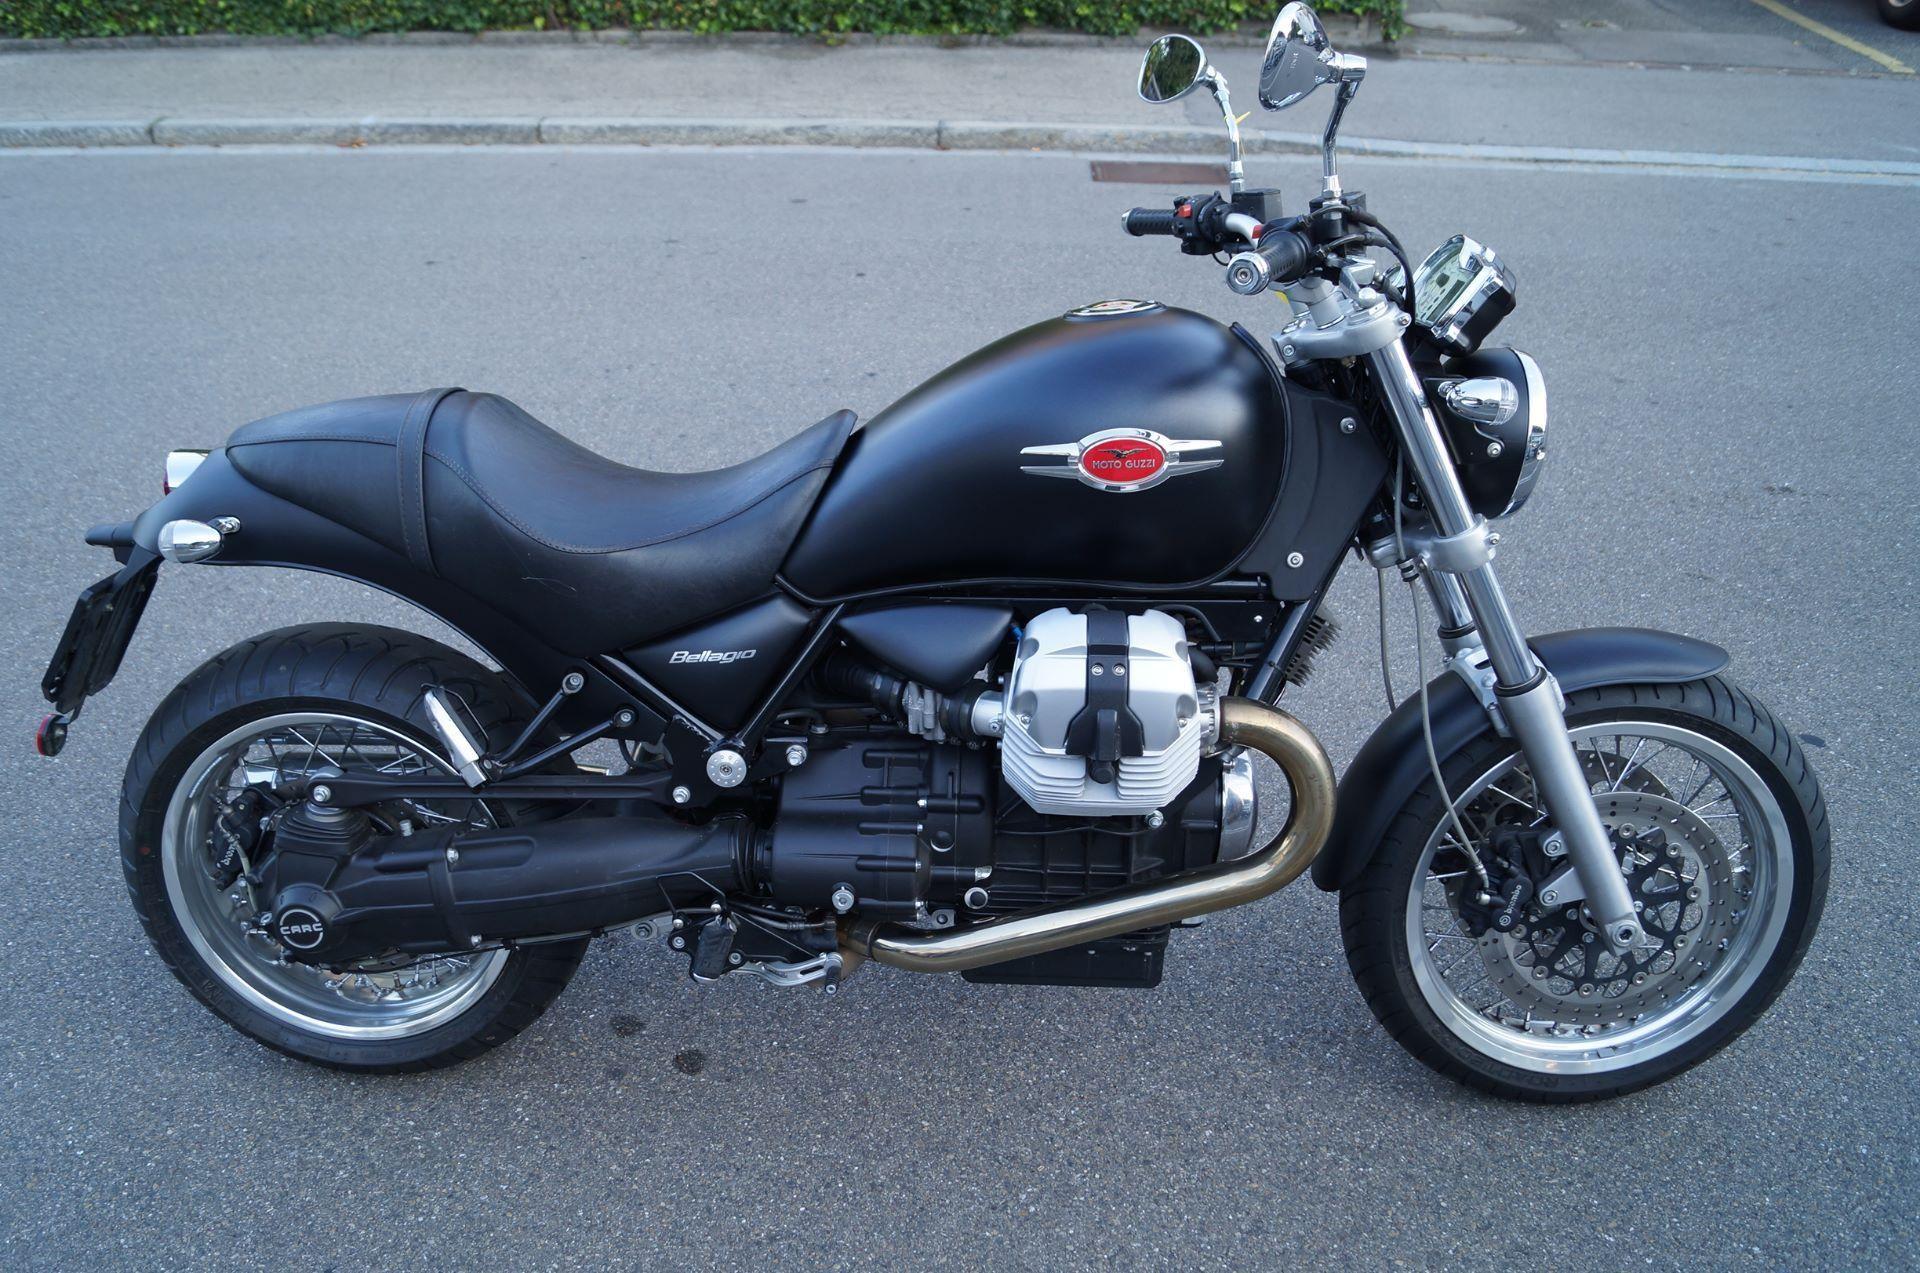 moto guzzi bellagio 940 scherrer motos steckborn occasion. Black Bedroom Furniture Sets. Home Design Ideas